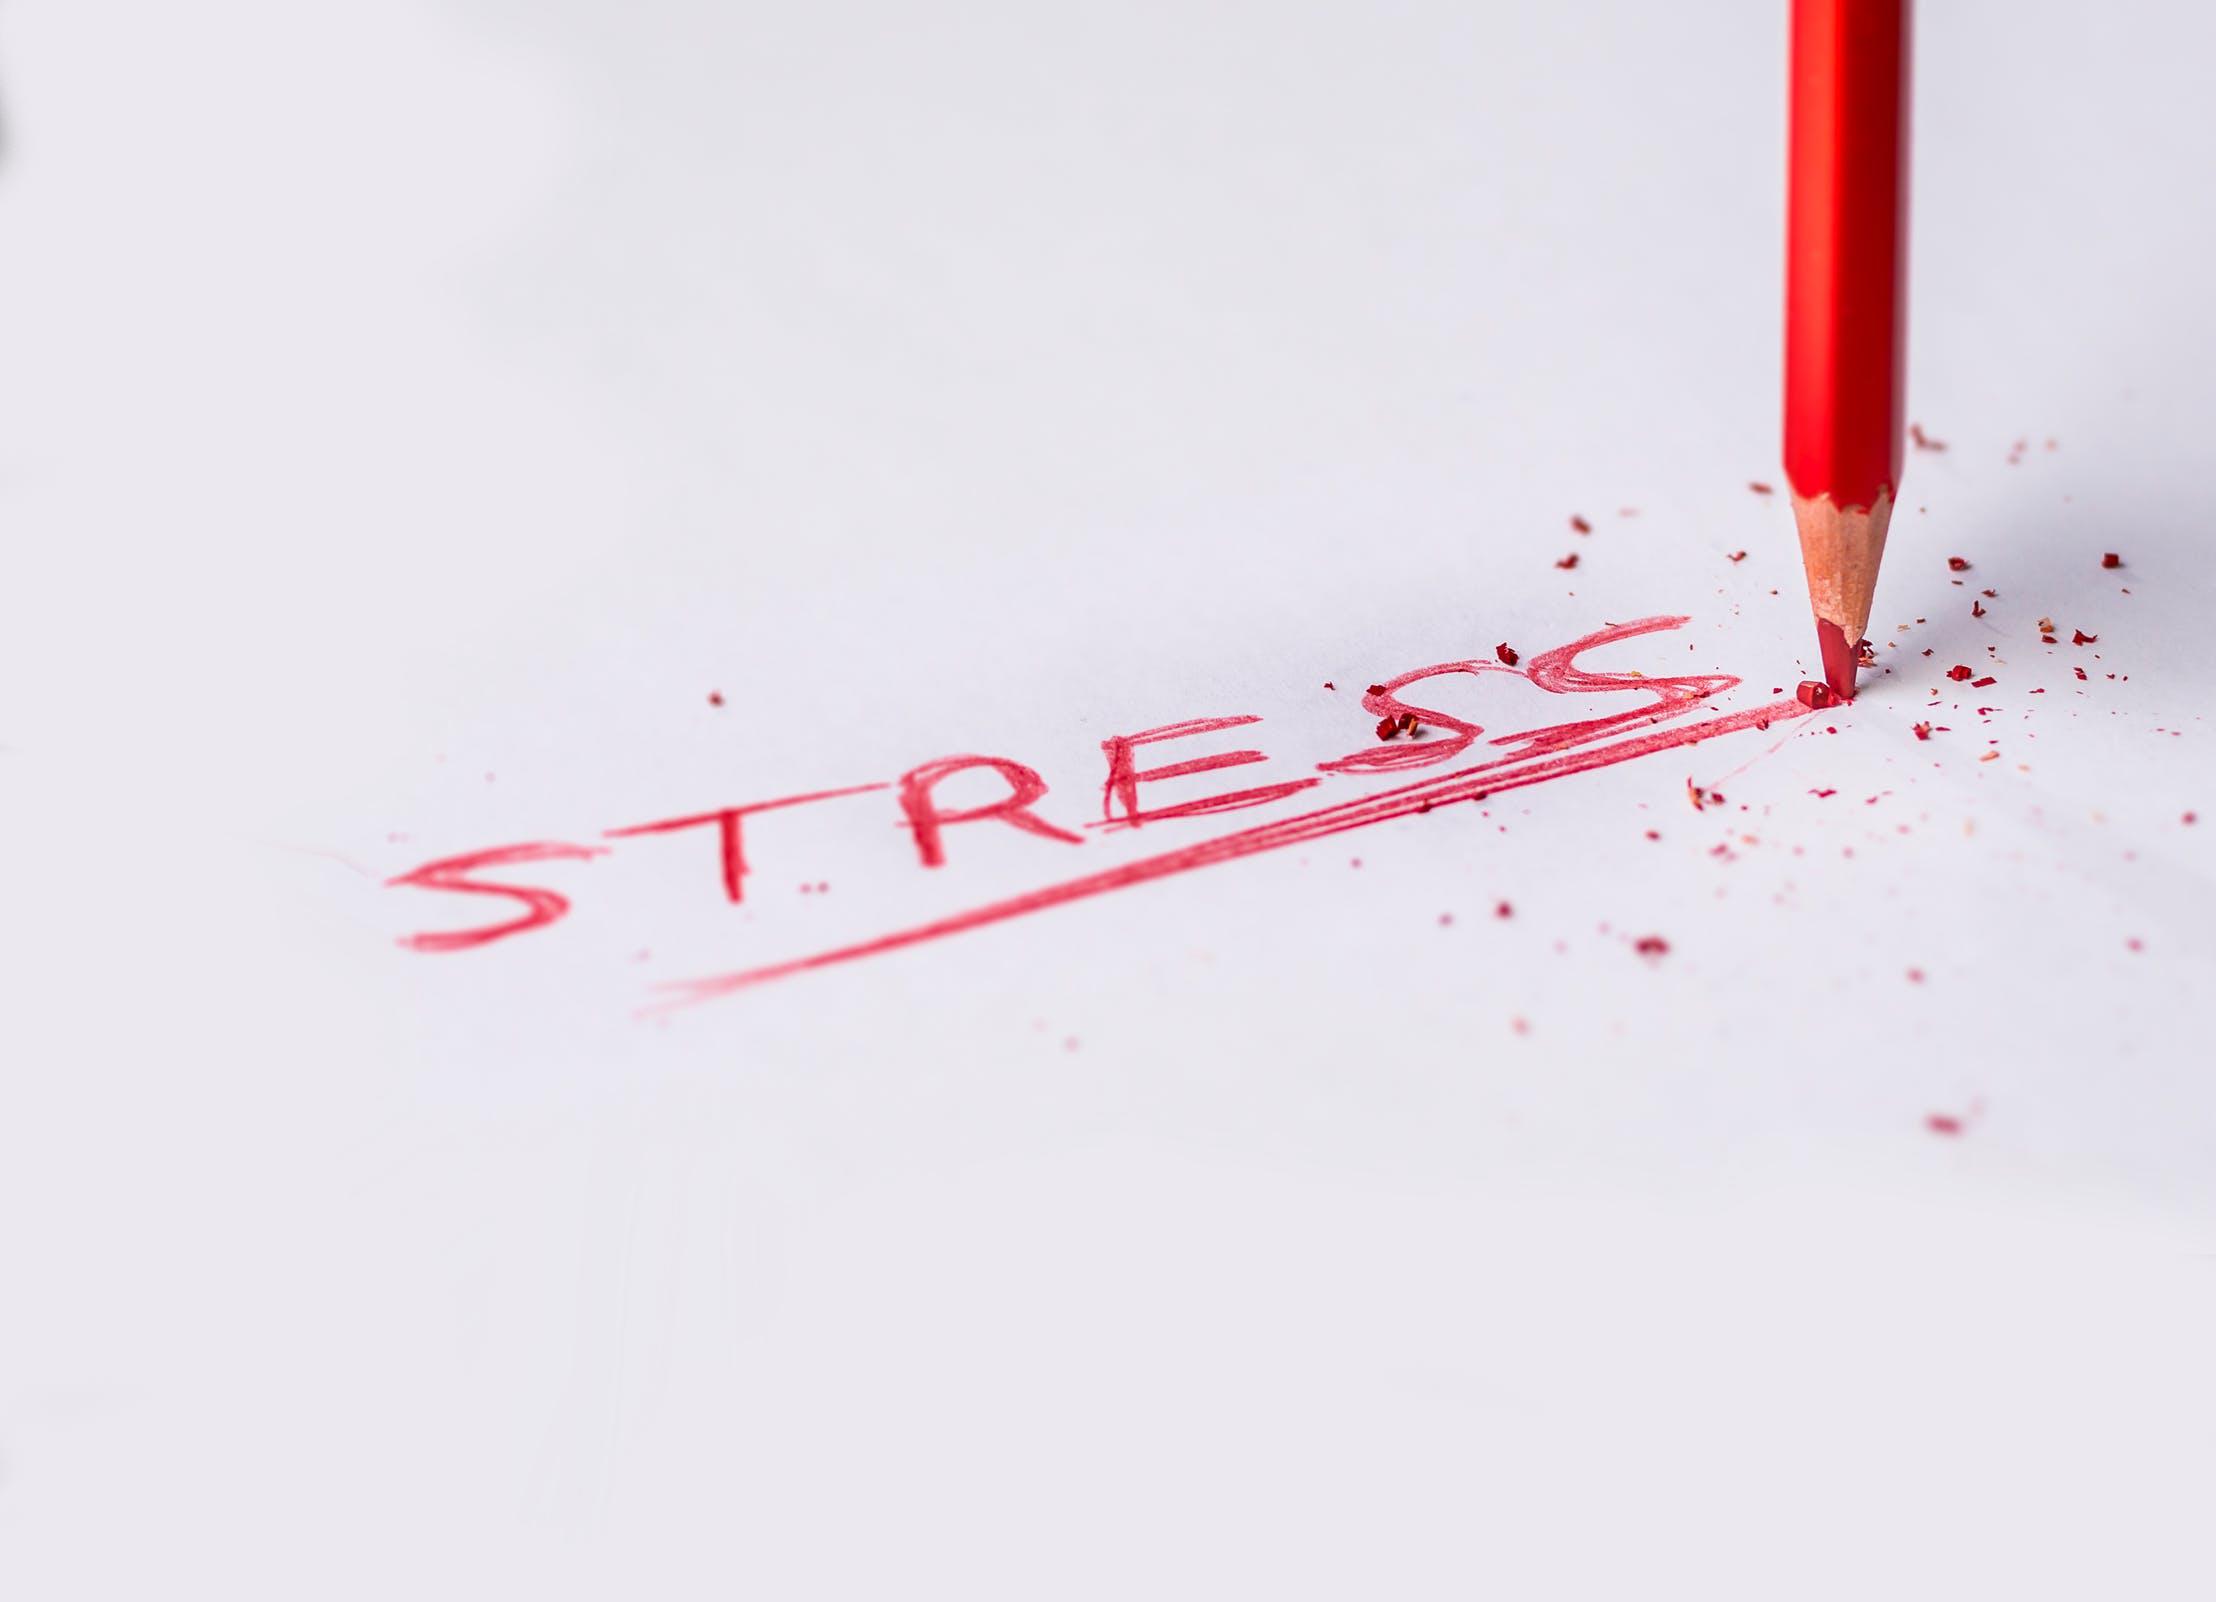 stress-spectrum the-stress-spectrum stress spectrum stress-spectrum stress spectrum